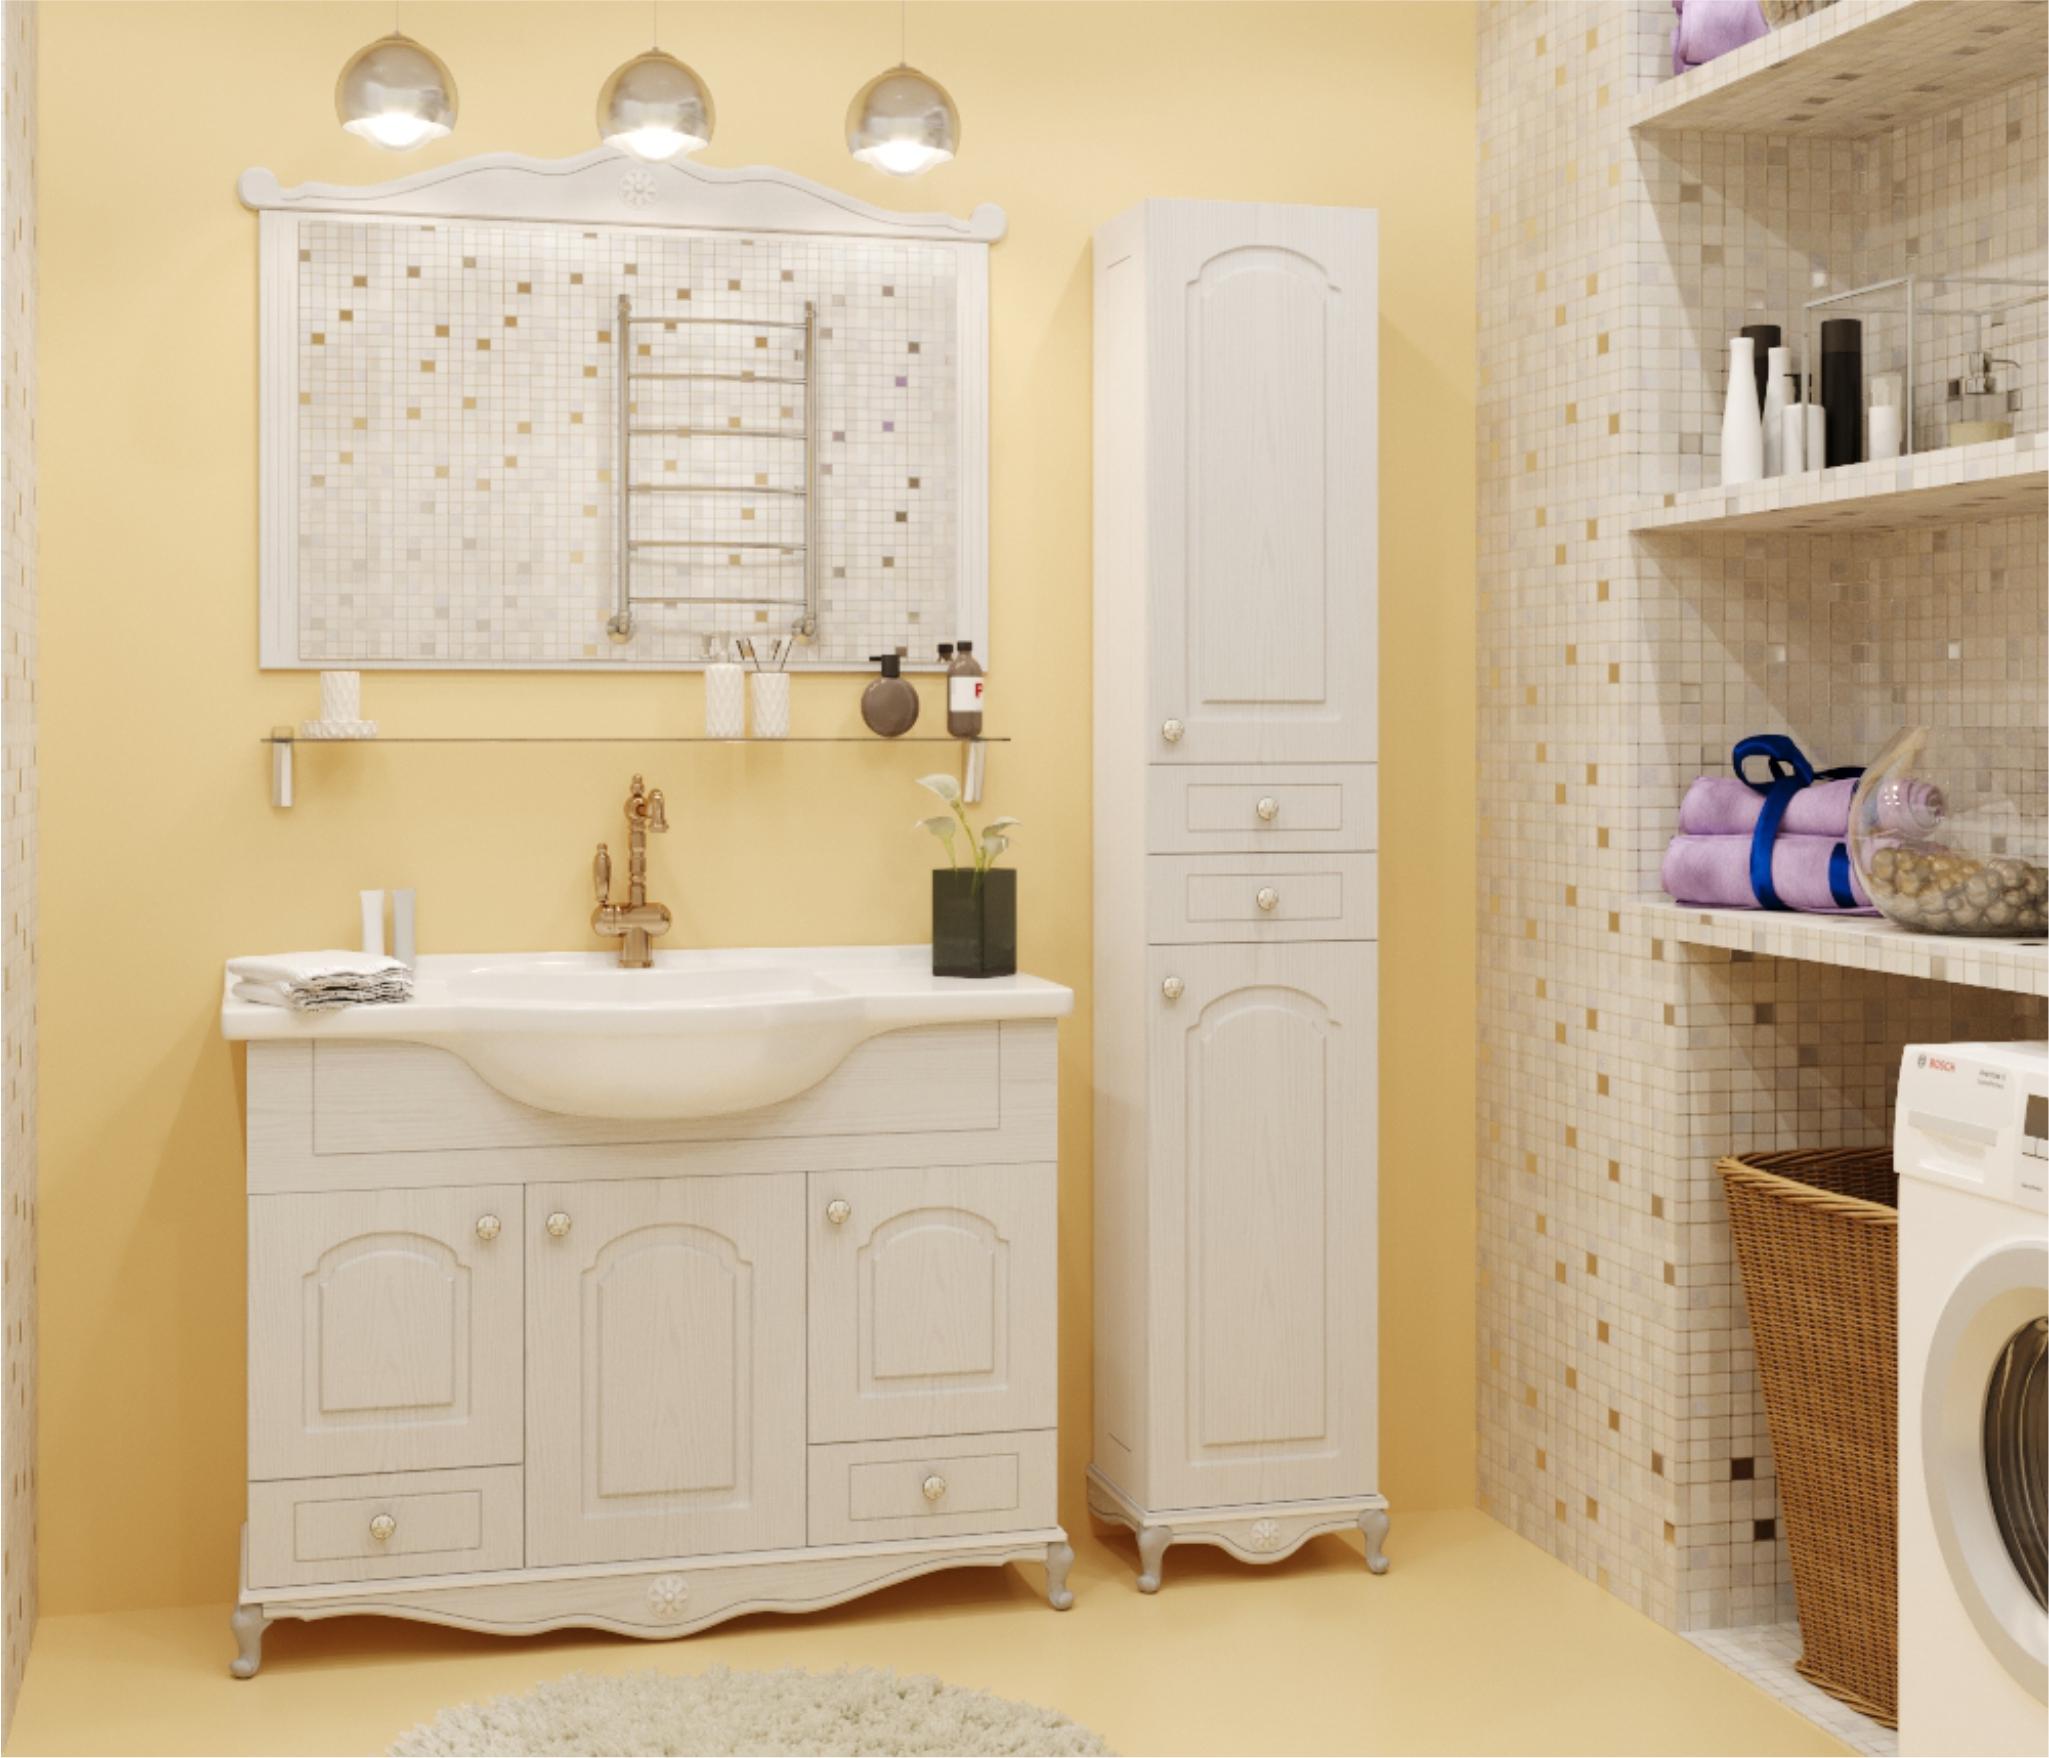 Набор мебели для ванной Mixline Прованс-80 белый ясень (зеркало, тумба на цоколе, раковина) недорого